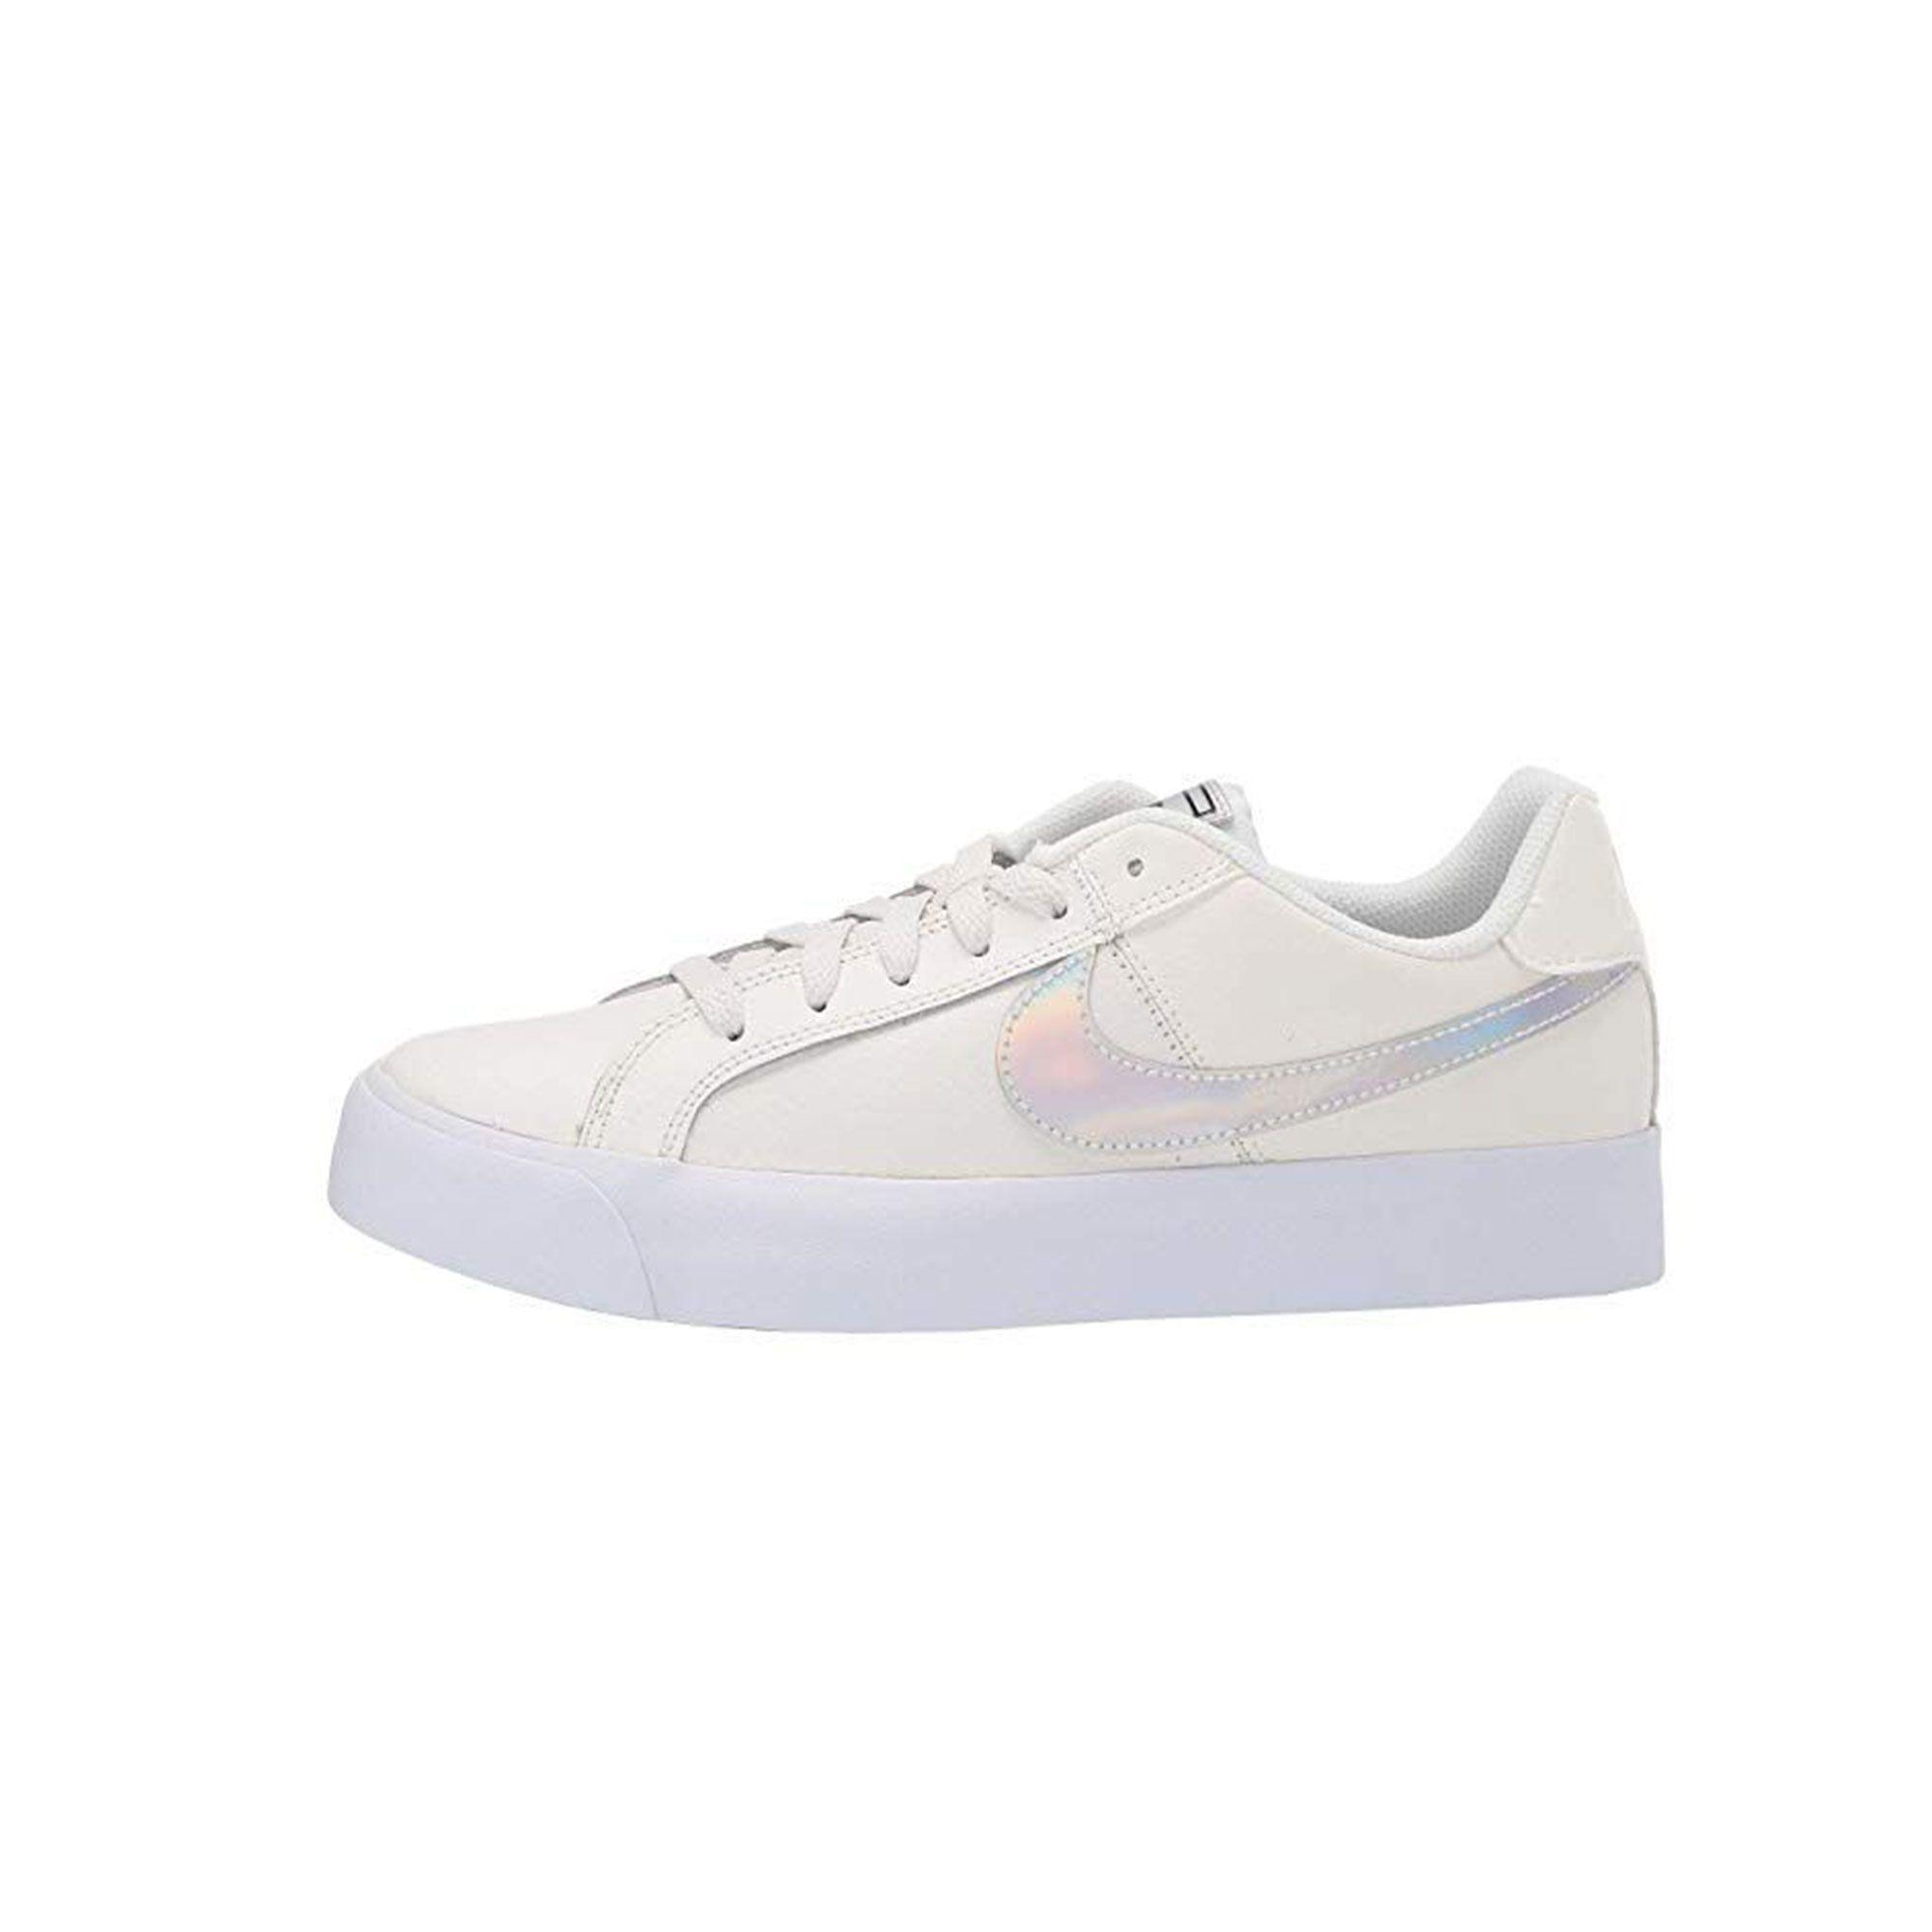 71f430be5befe 15 Best White Sneakers for Women in 2019